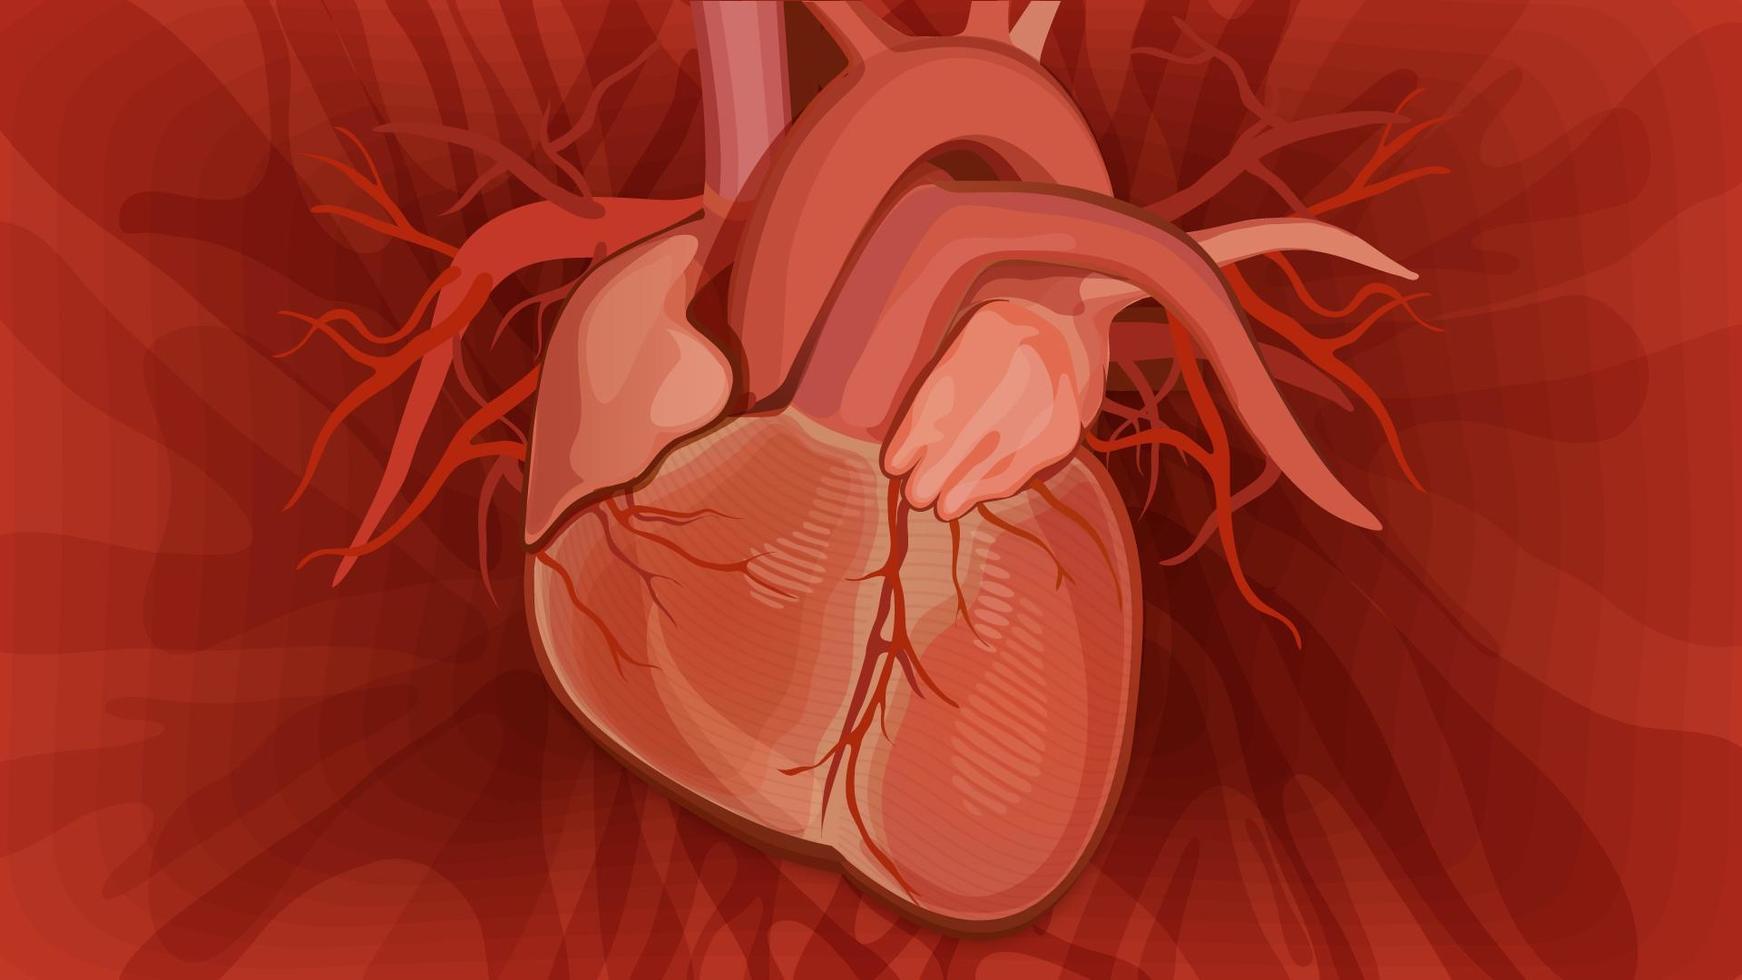 anatomisch hart op rode achtergrond. vector